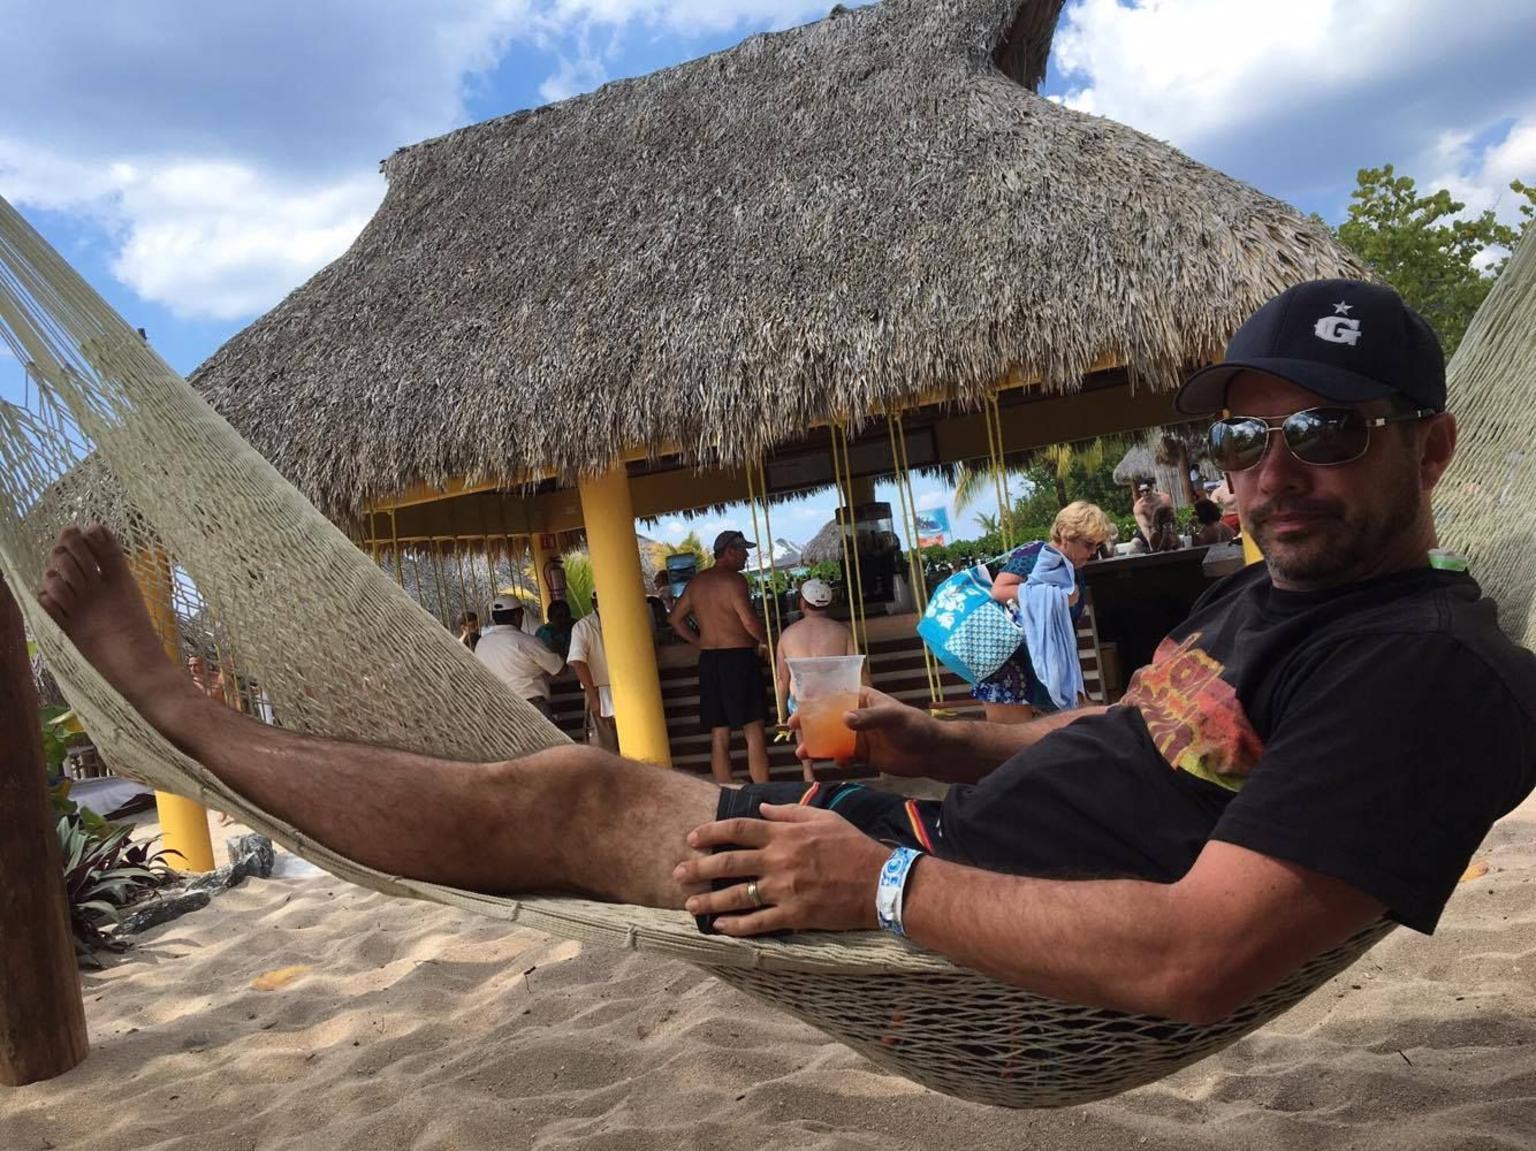 MORE PHOTOS, Mr. Sanchos Beach Club All-Inclusive Day Pass